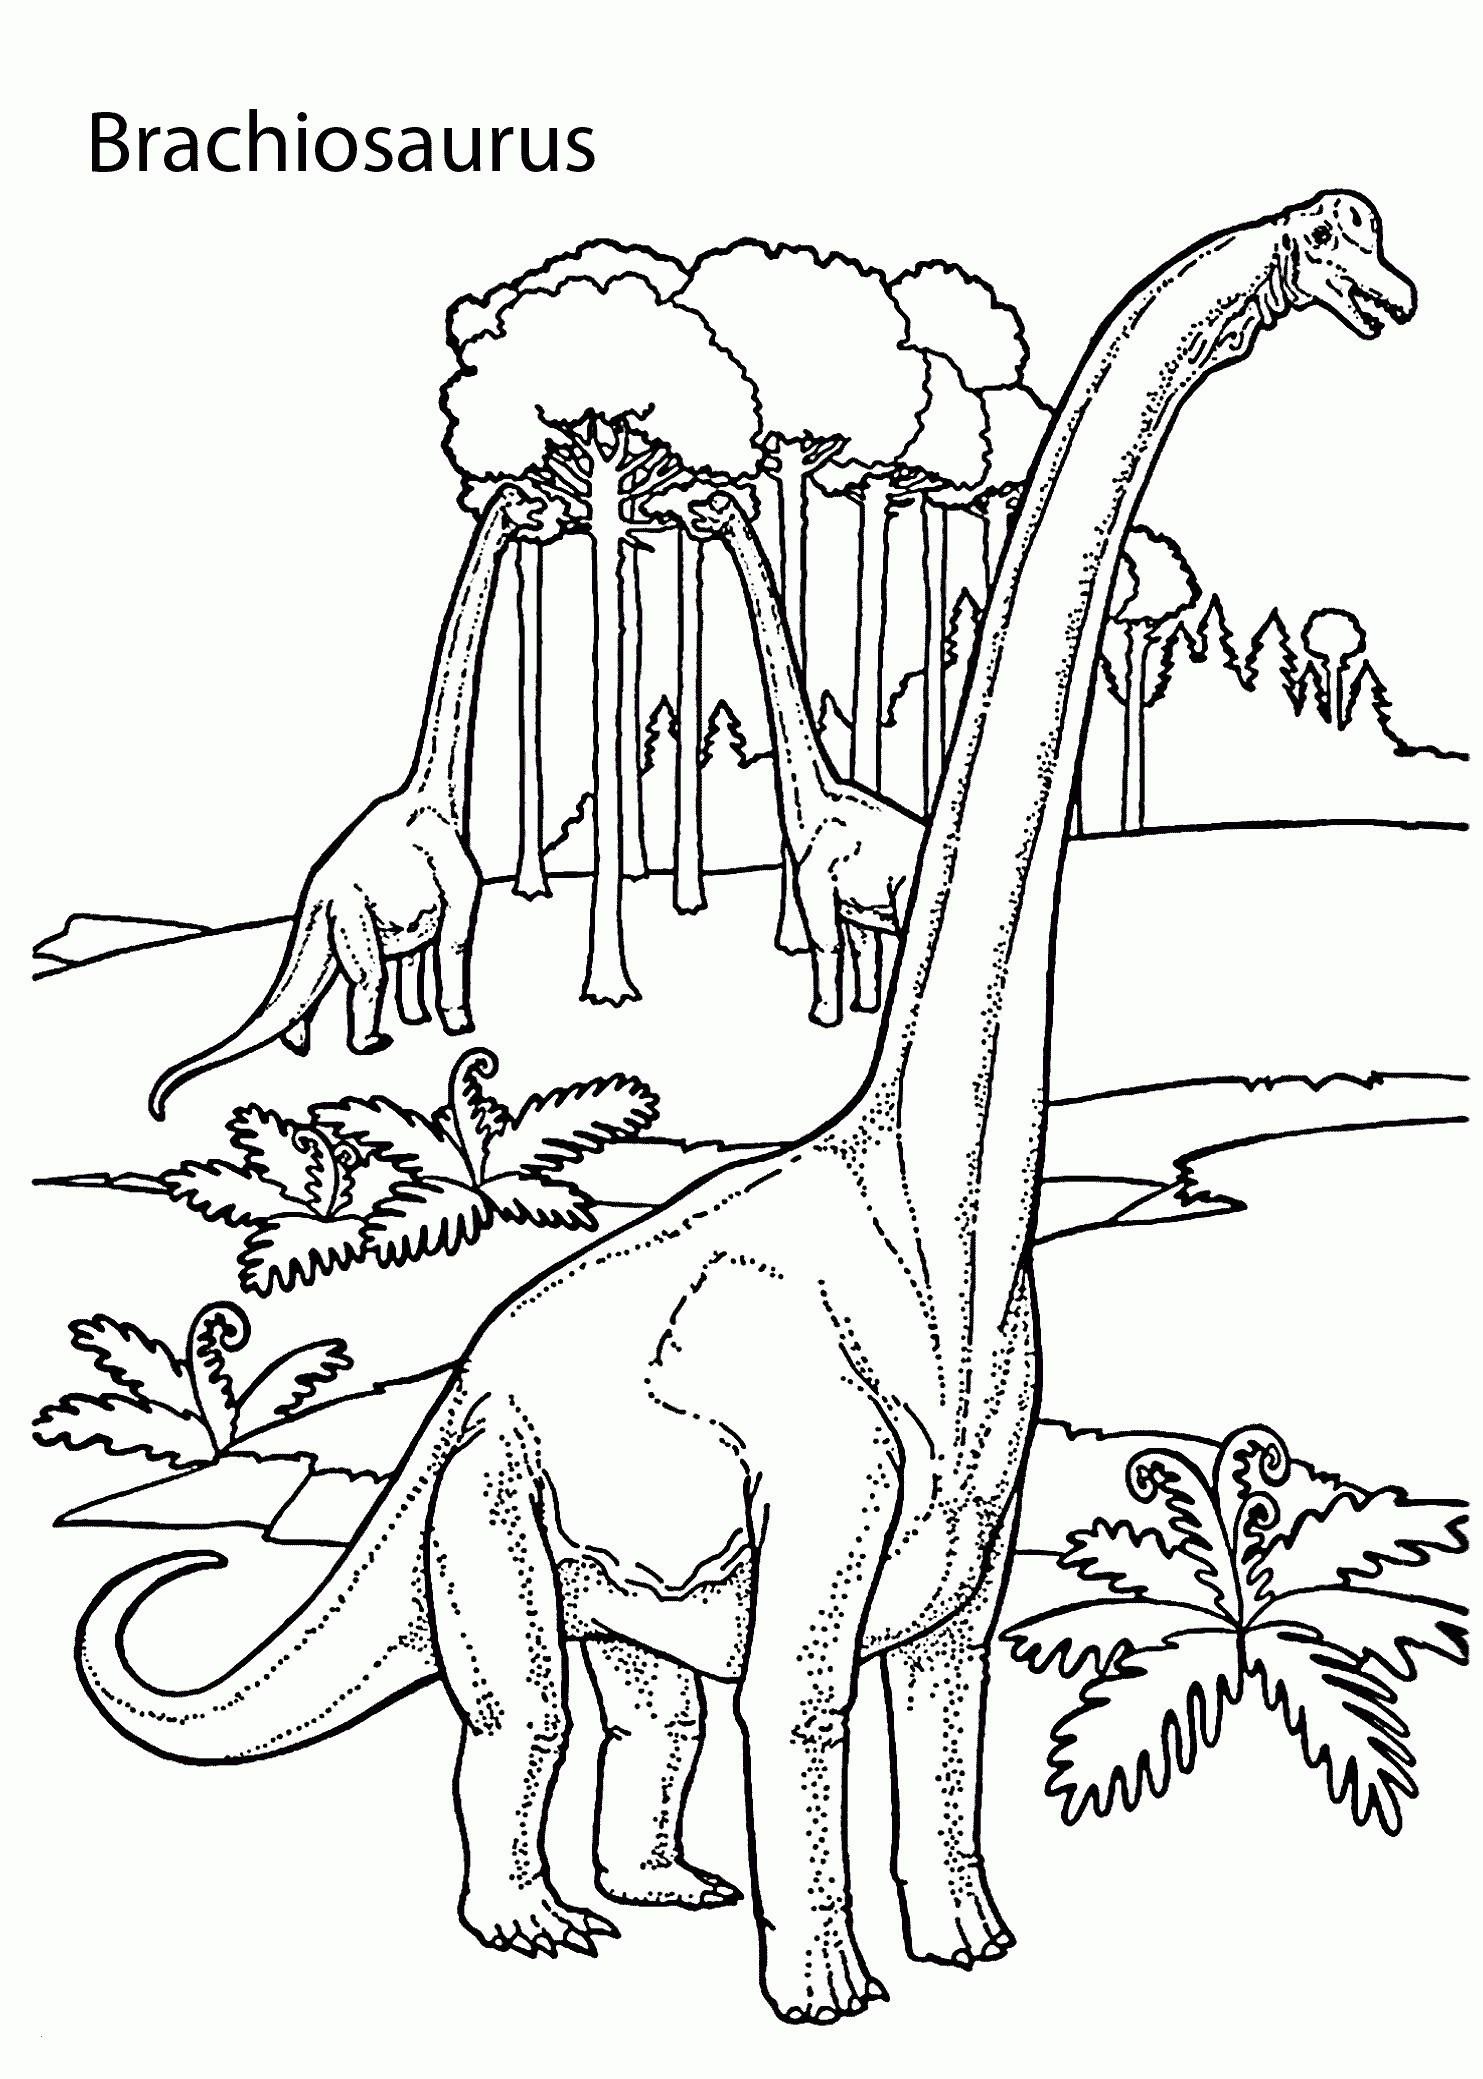 Jurassic World Ausmalbilder Neu Ausmalbilder Jurassic World Schön Spinosaurus Ausmalbilder – Neu Sammlung